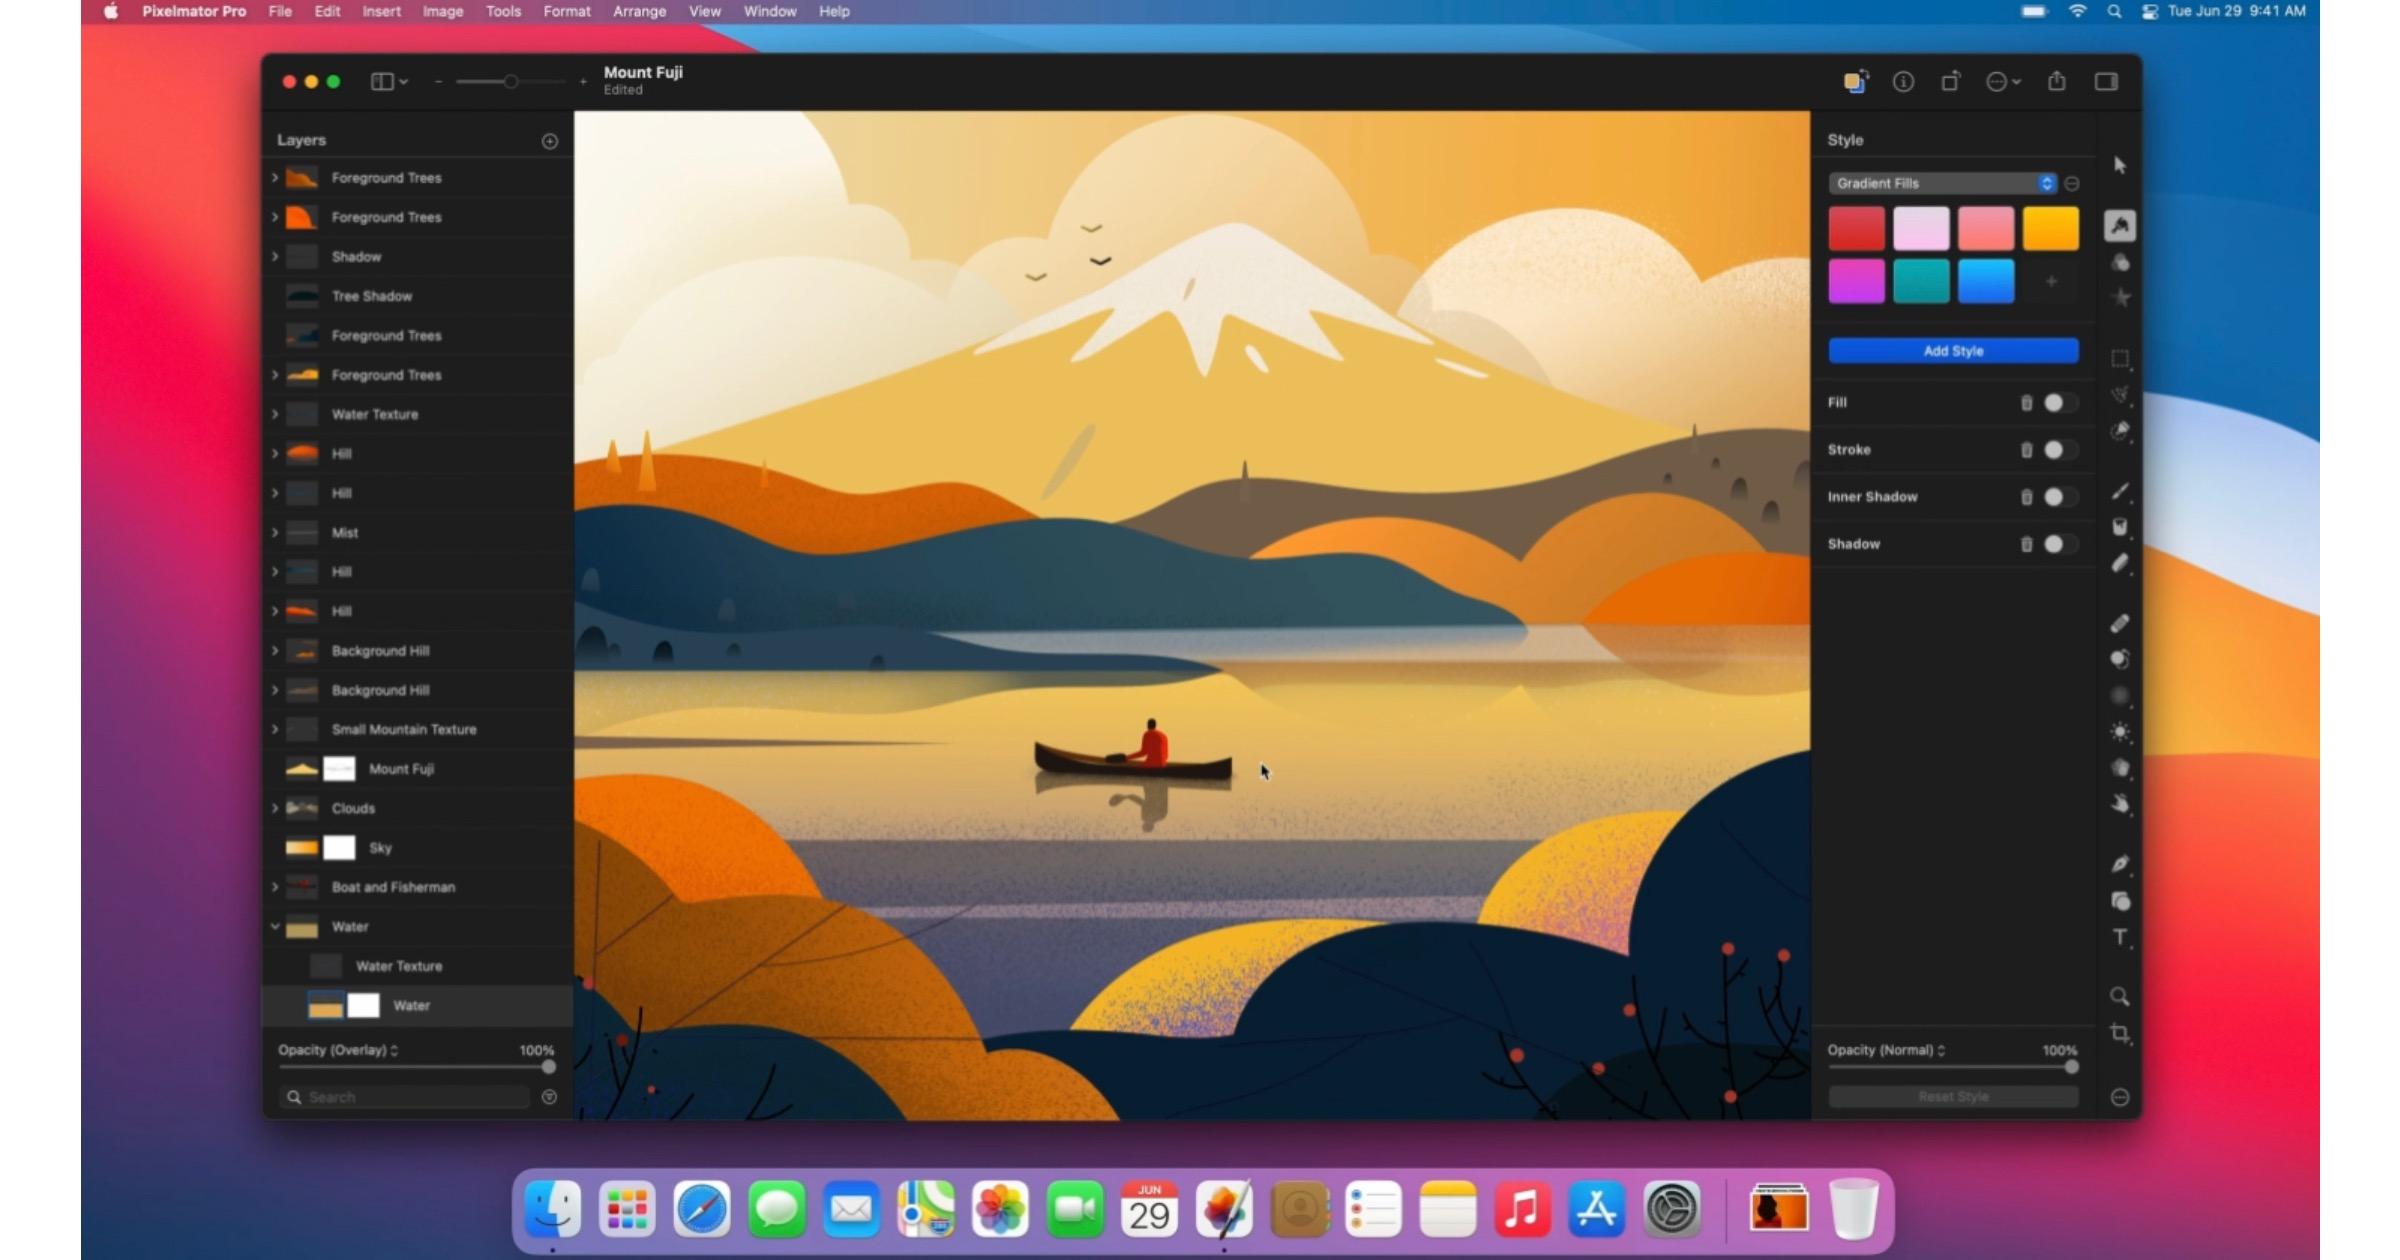 Pixelmator pro 2.1 update